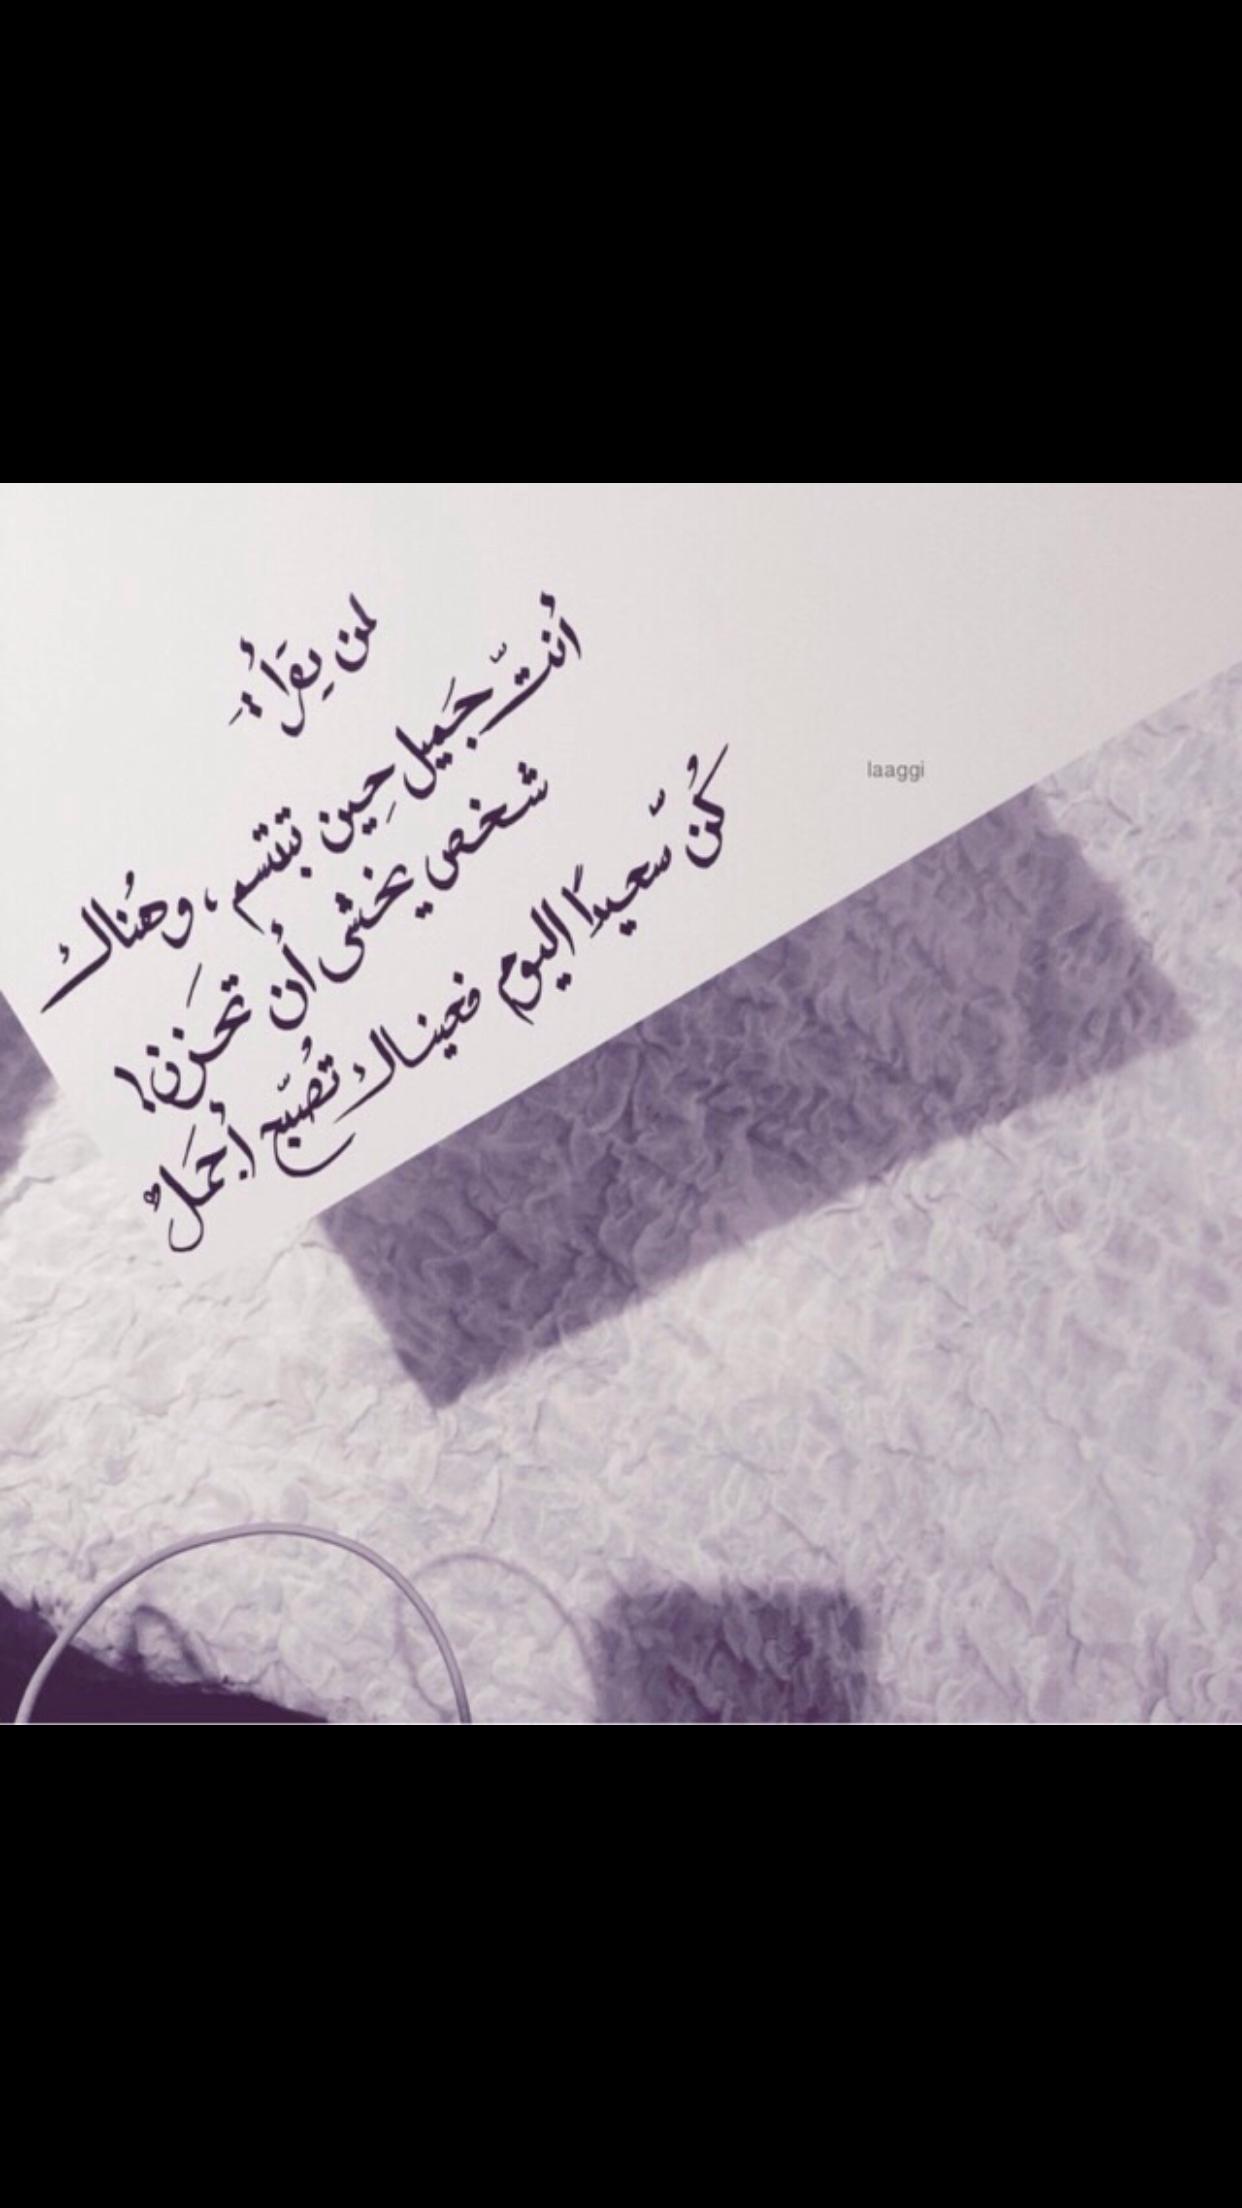 Pin By Malek Barakah On مقــهى أحلى الكلمات و بريـــق حروفها Love Words Words Arabic Words